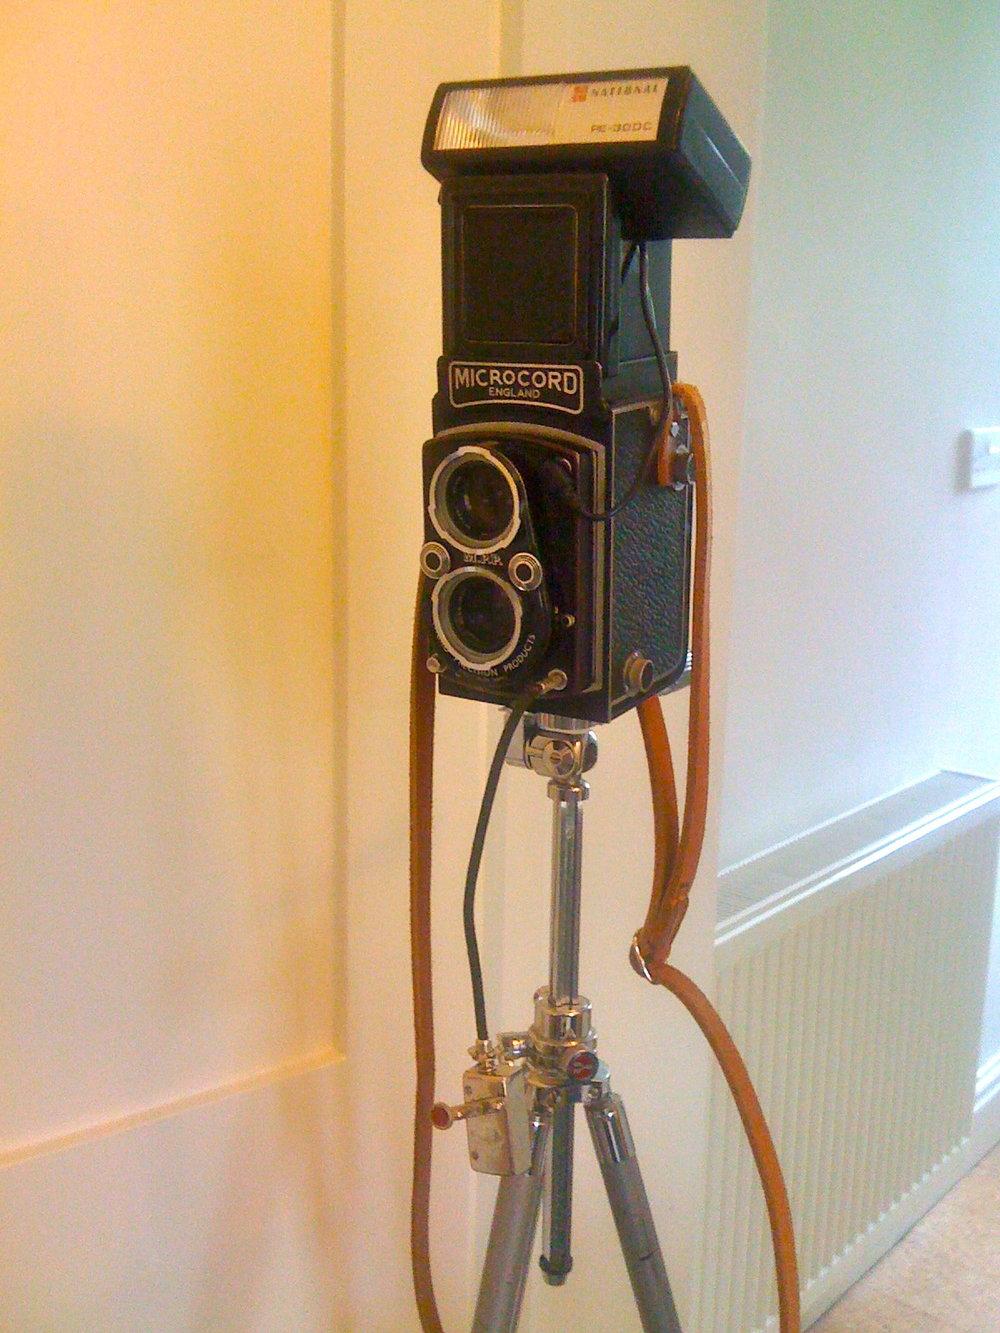 Super Dork-Tastic Self Portrait Rig…     MPP Microcord   Leningrad 8 Meter   Yashica Tripod   National Flash   Haka Autoknips